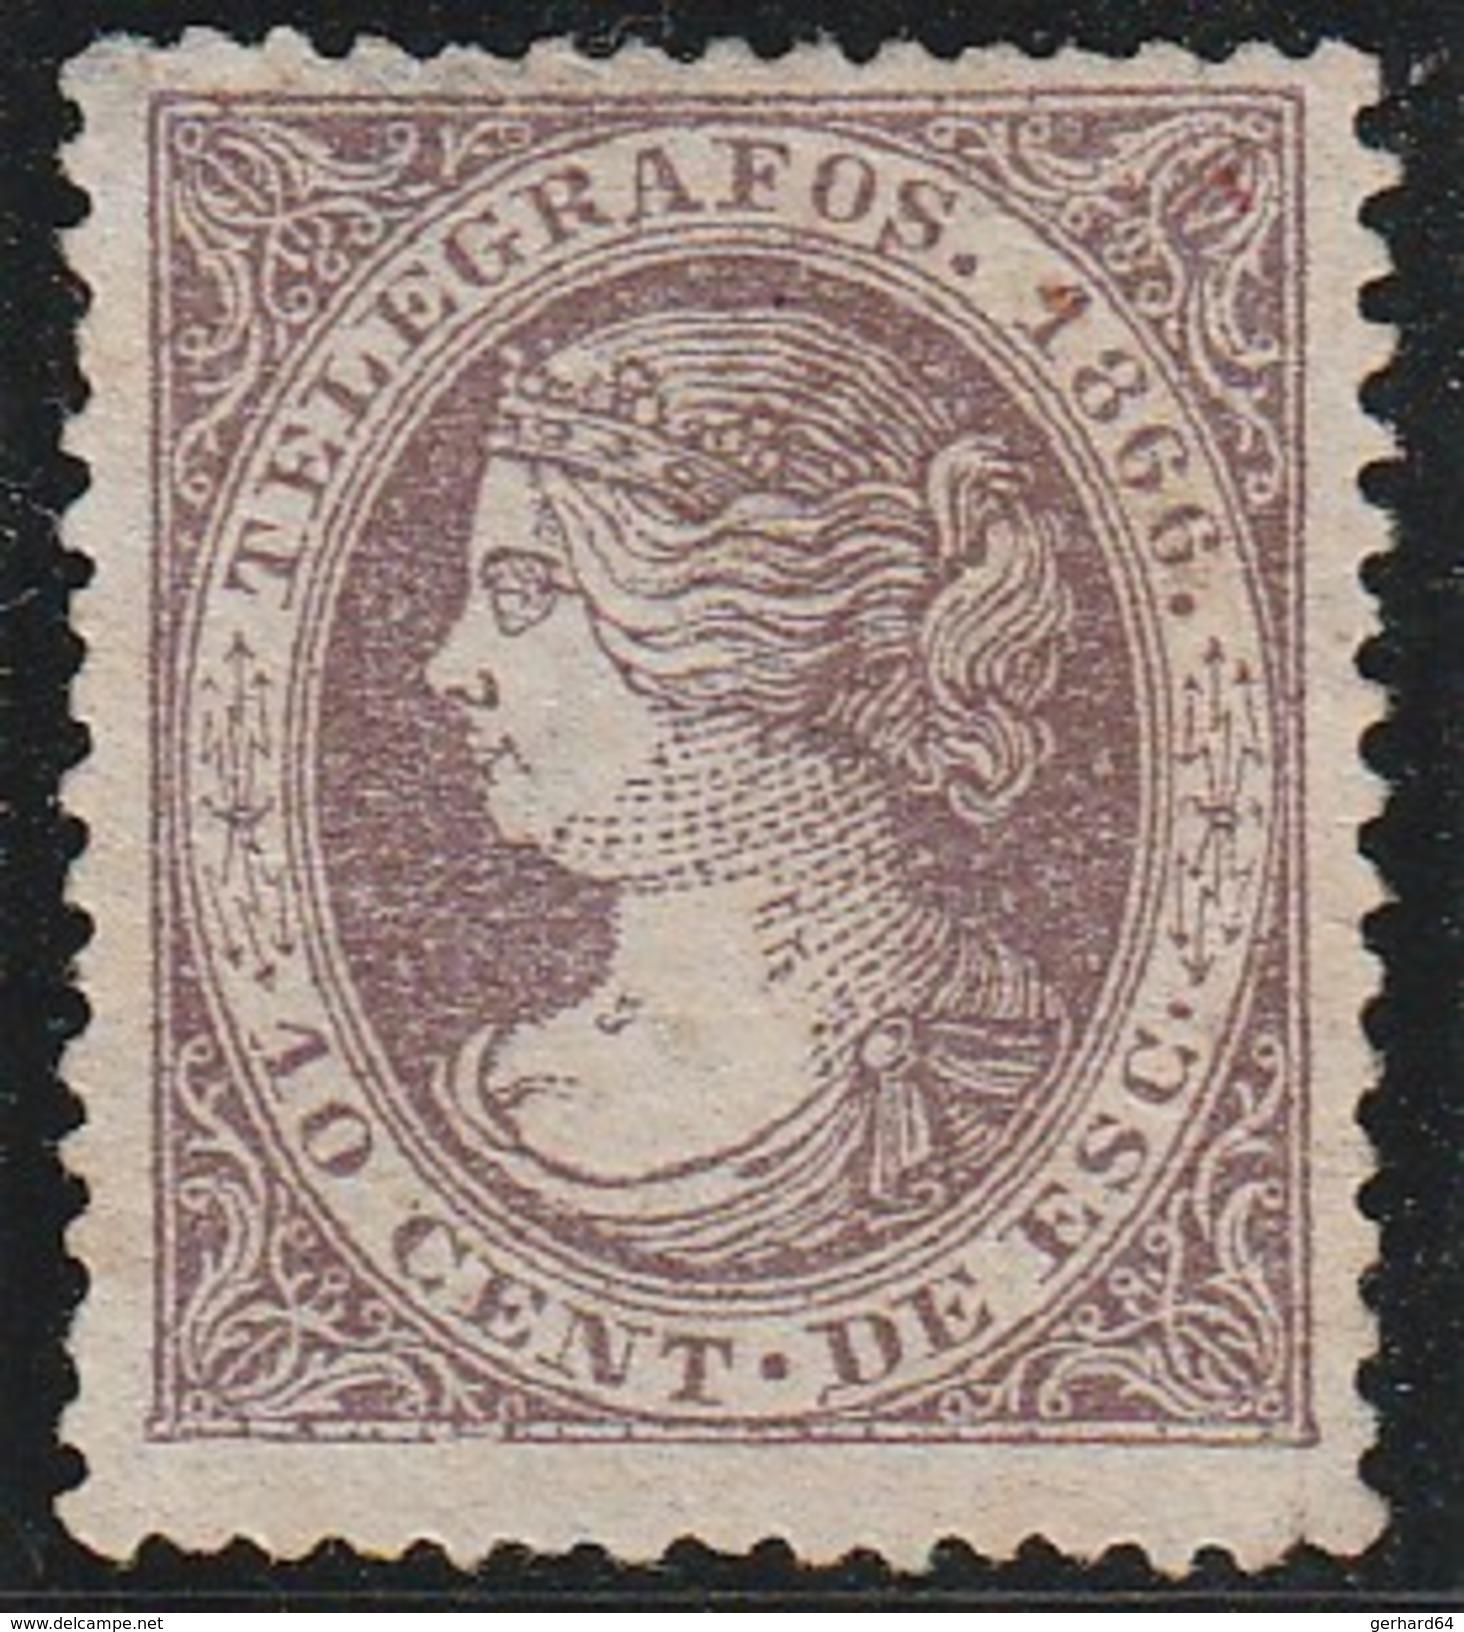 ESPAGNE 1866 - Télégraphe (Telegrafos) N° 13 - Neuf Sans Gomme - Télégraphe